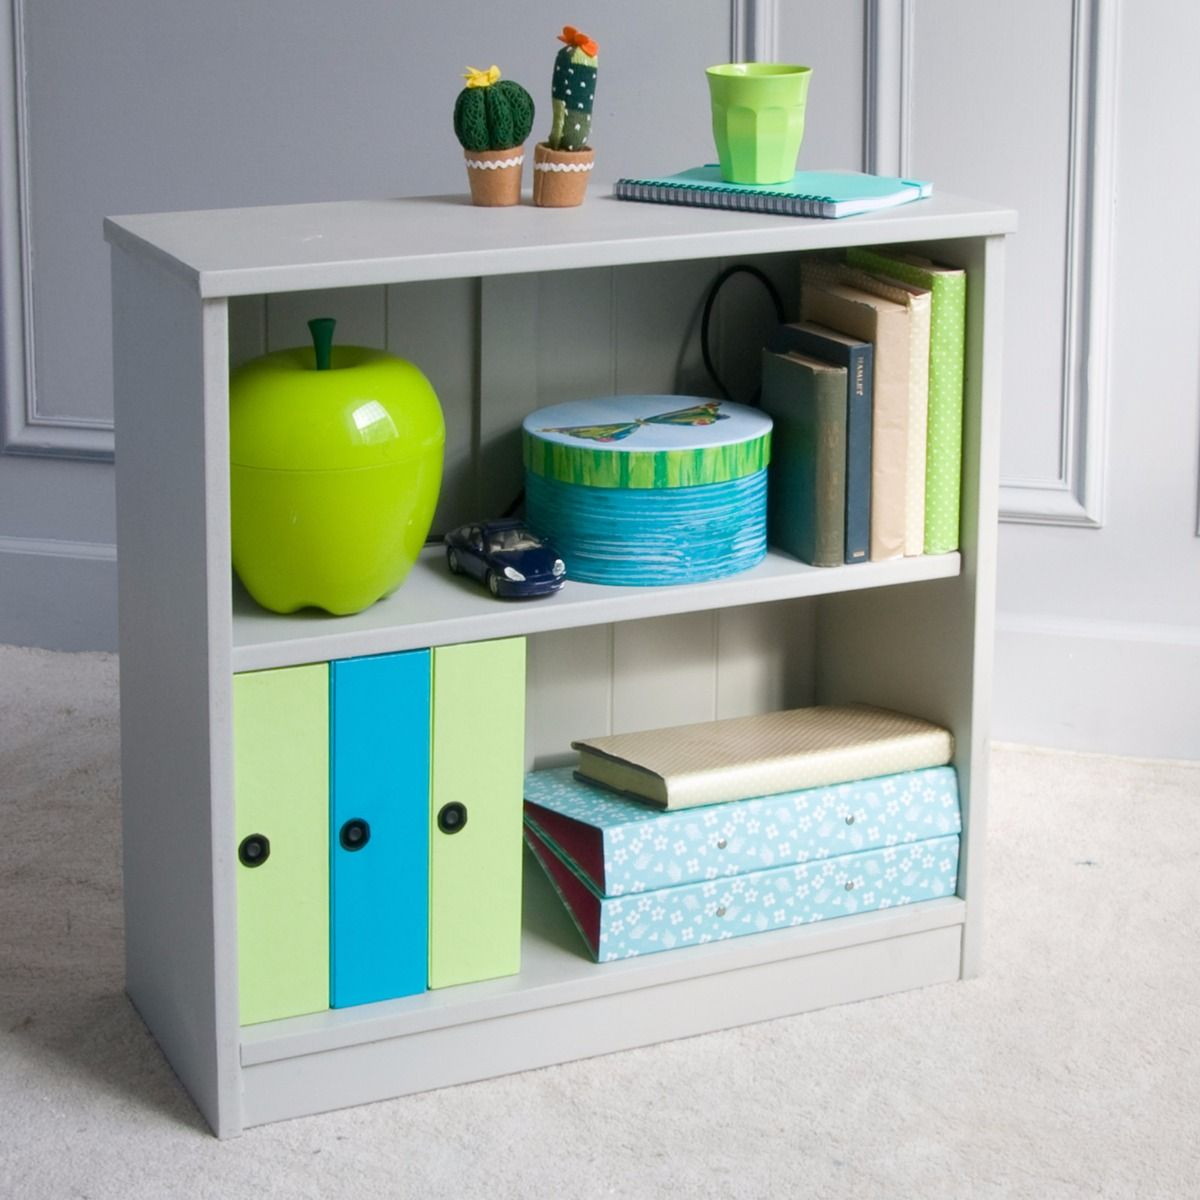 Fargo Storage Bookcase Farleigh Grey By Little Folks For Kids